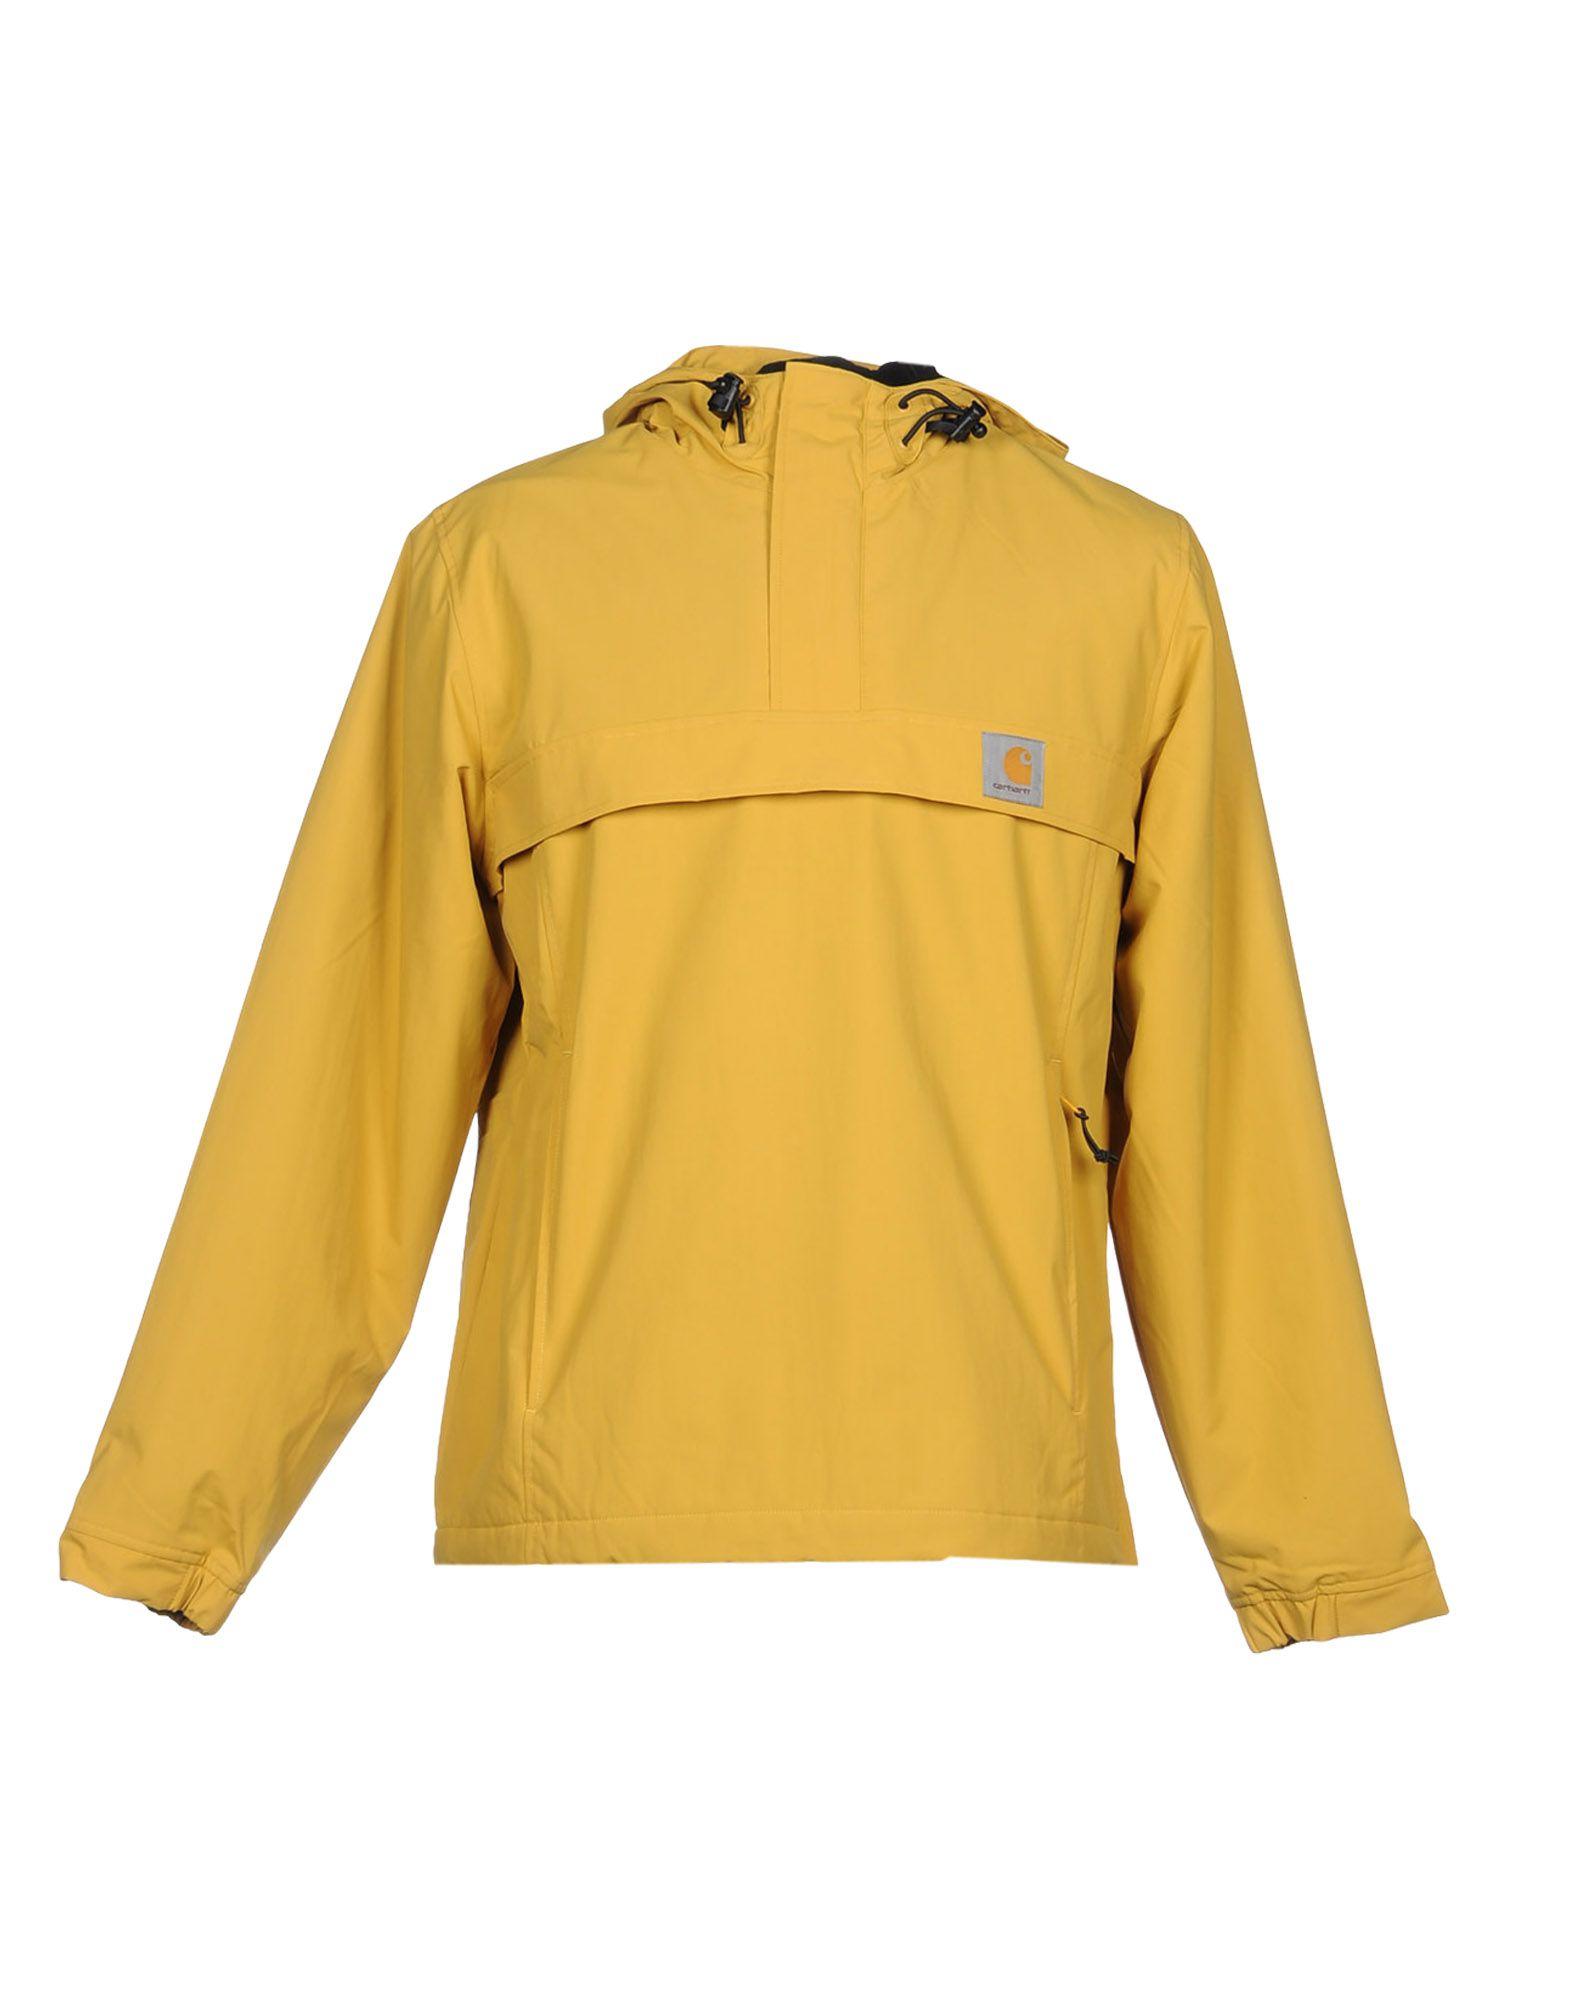 Carhartt Jackets in Yellow for Men | Lyst